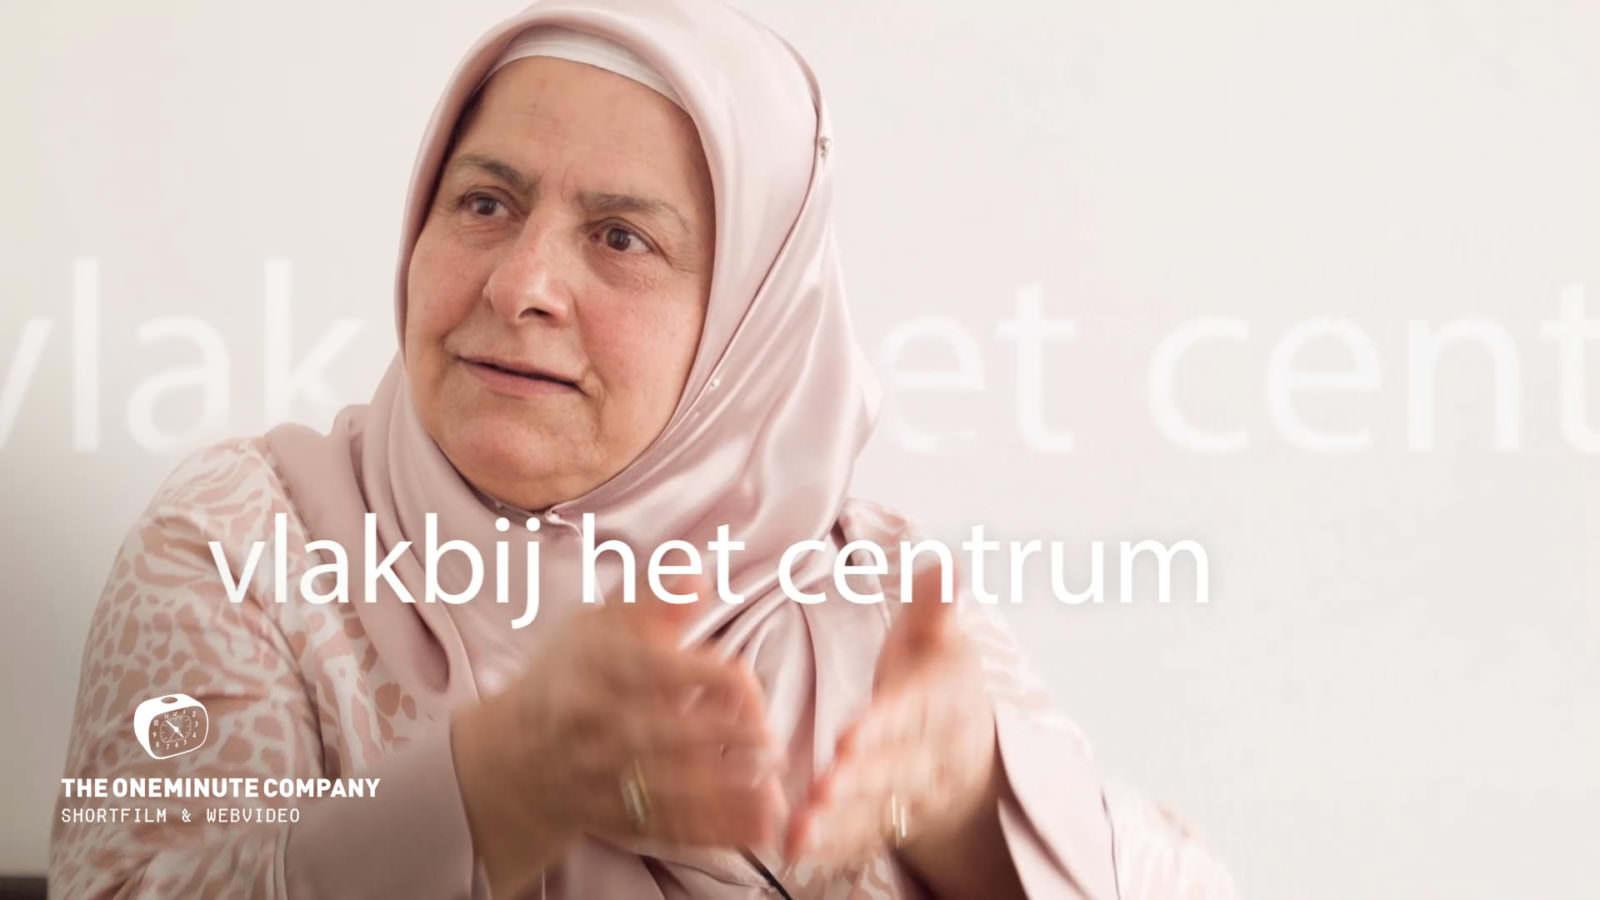 Project Promo | Waterkwartier Zutphen - Diversiteit in Cultuur